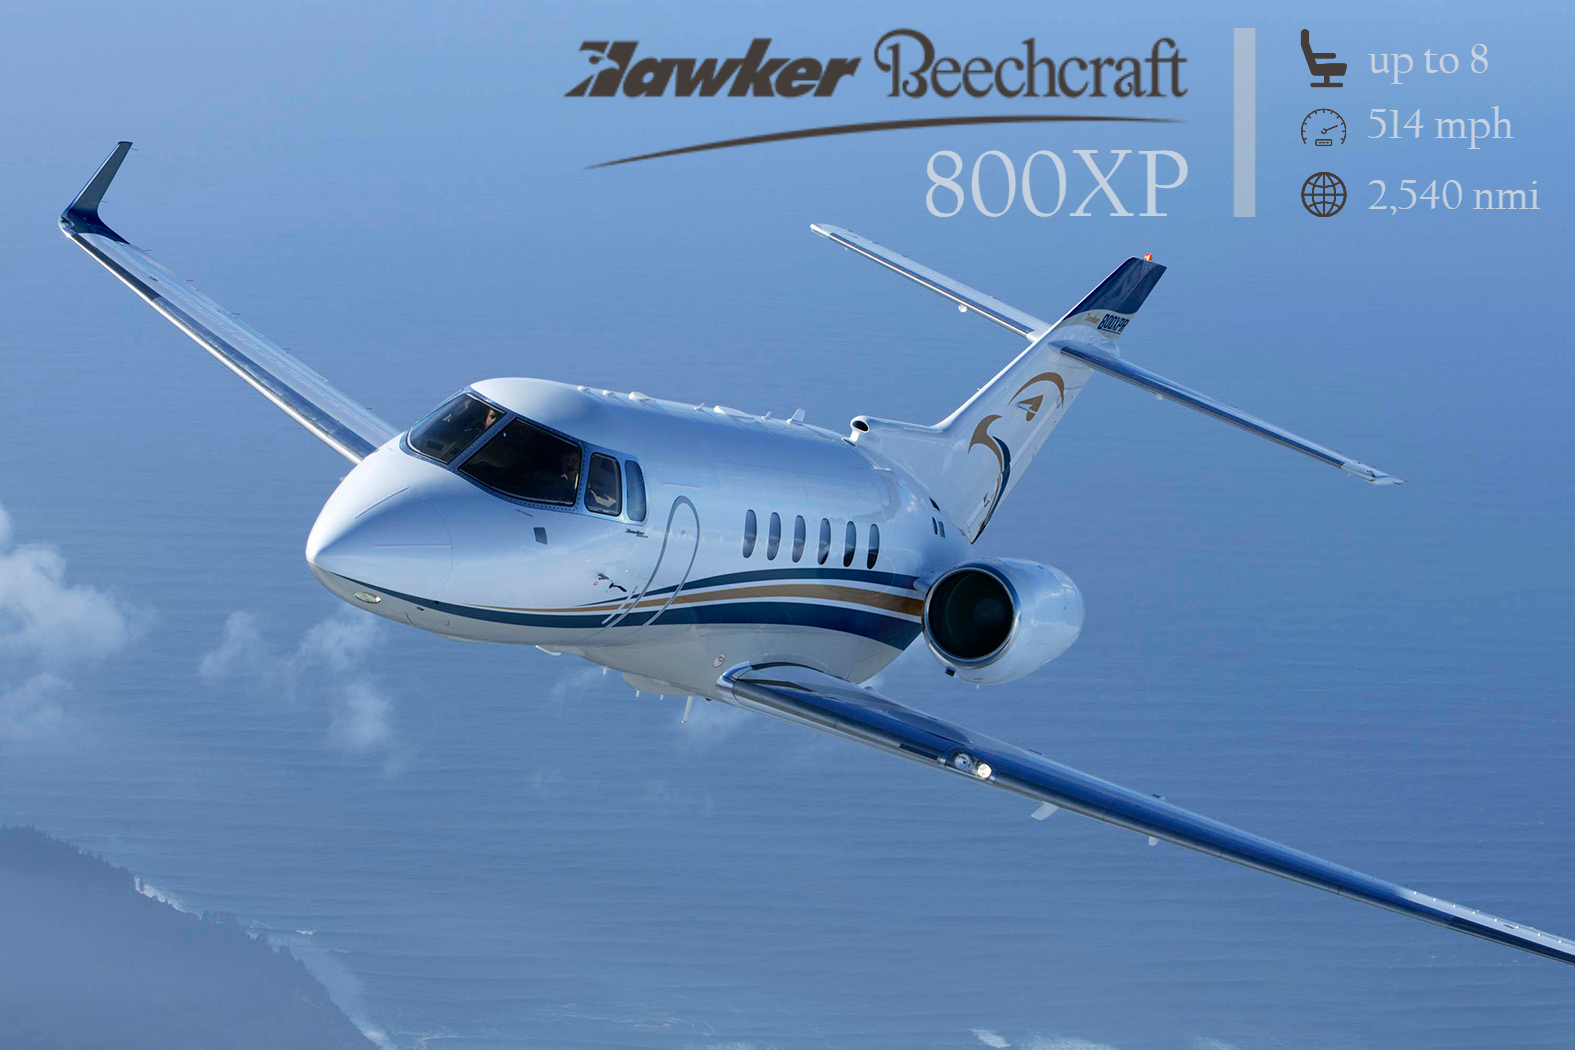 hawker 800xp charter